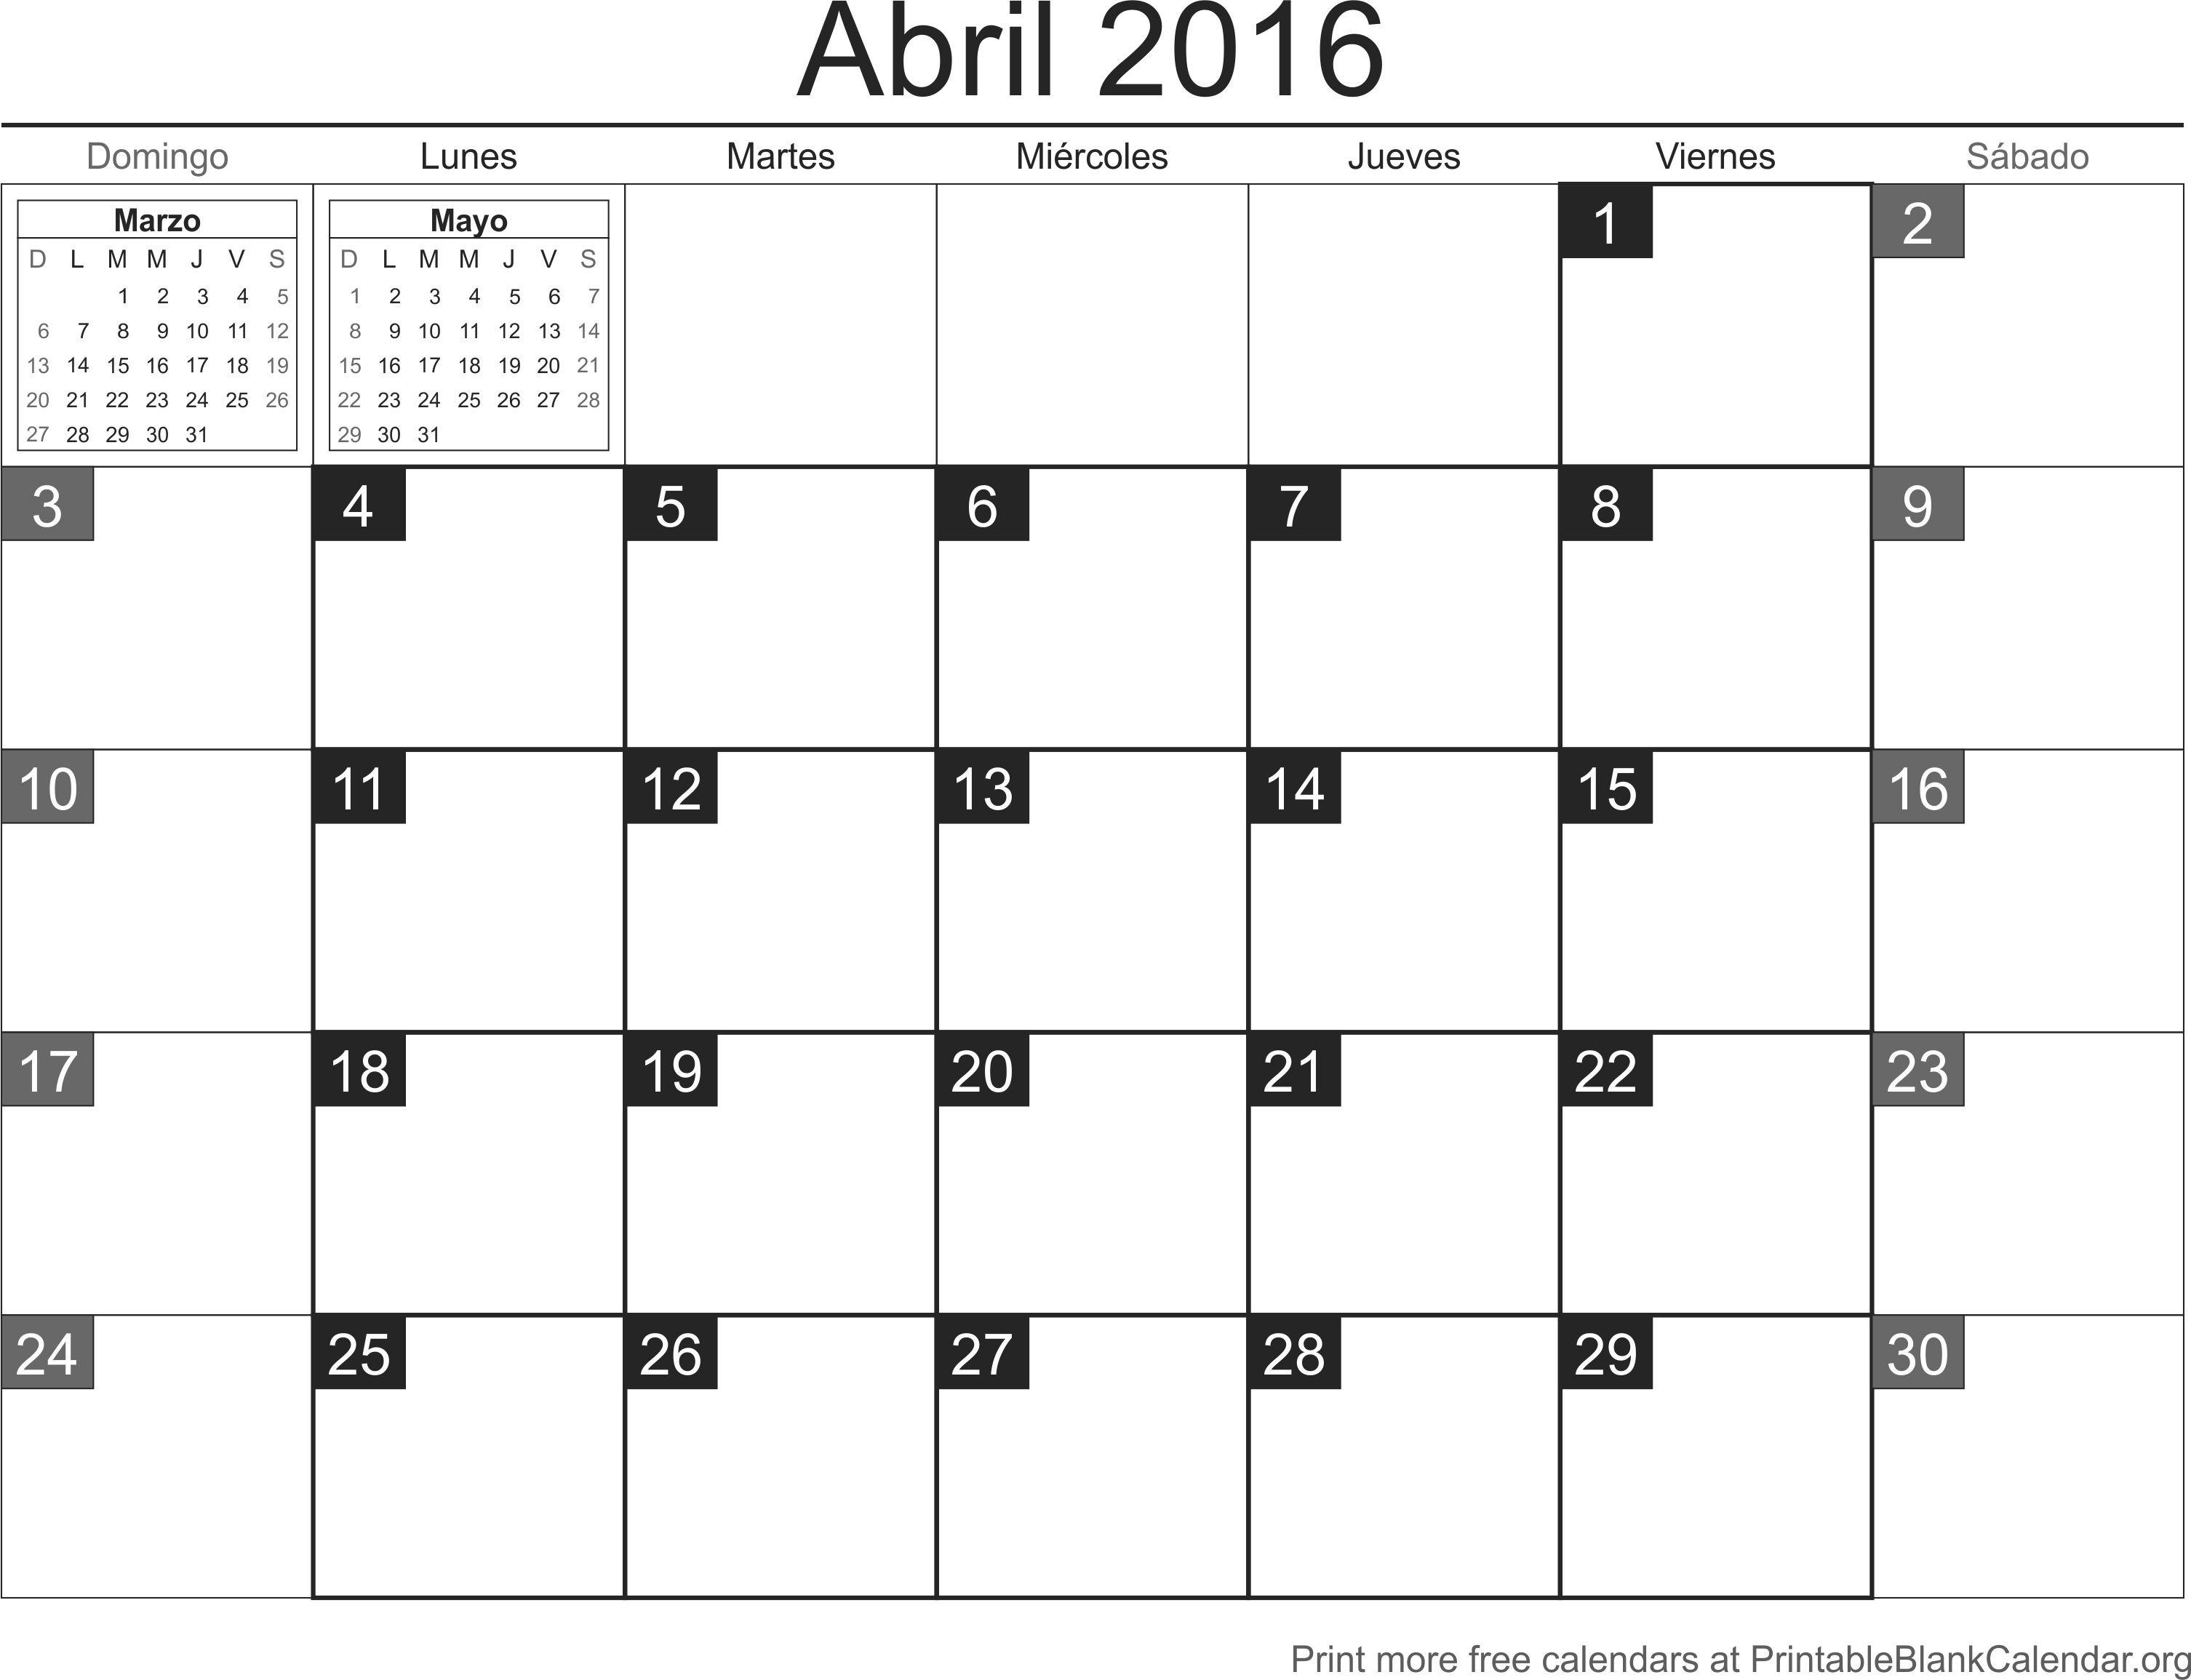 Calendario 2019 Argentina Para Imprimir Con Feriados Más Actual Calendarios 2016 Para Imprimir Calendario Abril 2016 Agenda Of Calendario 2019 Argentina Para Imprimir Con Feriados Más Caliente Calendario 2018 Con Festivos